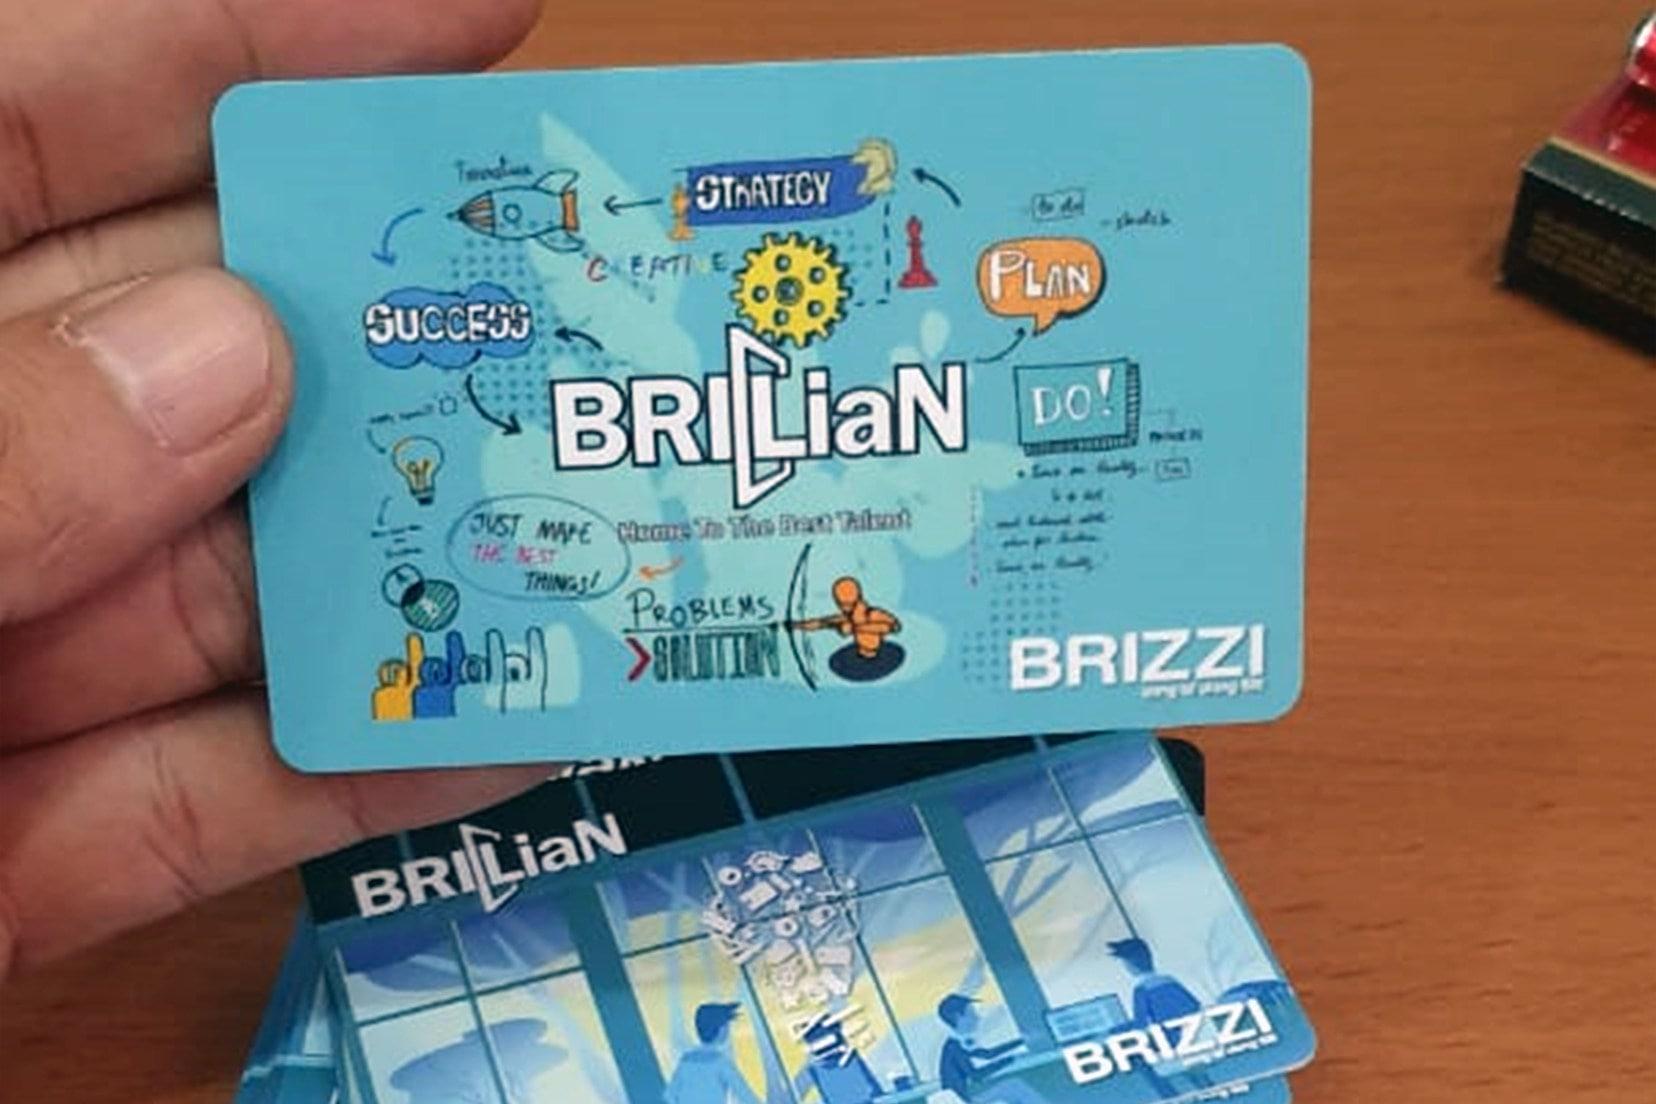 Brizzi Custom, Desain Sendiri Kartu Brizzi   e-Money e-Toll